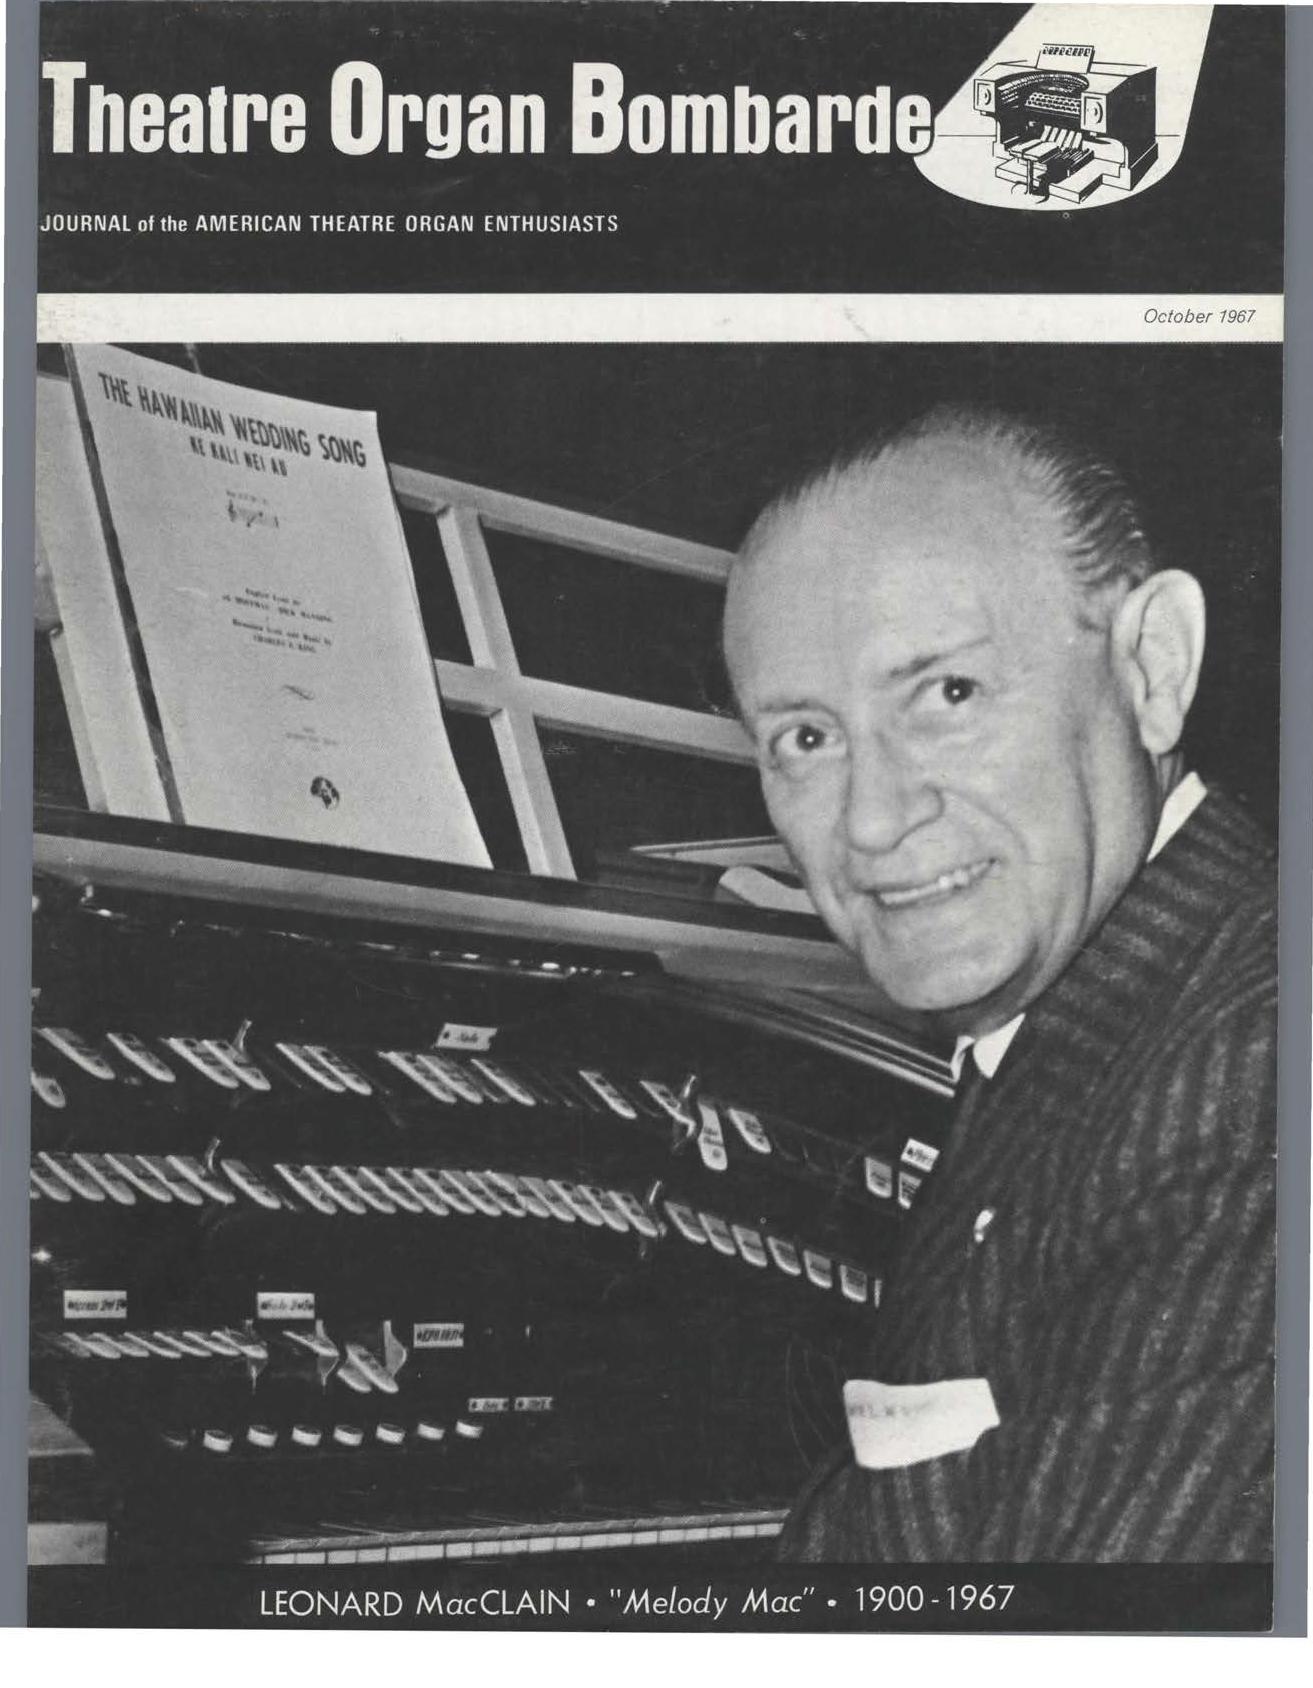 Theatre Organ, October 1967, Volume 9, Number 5